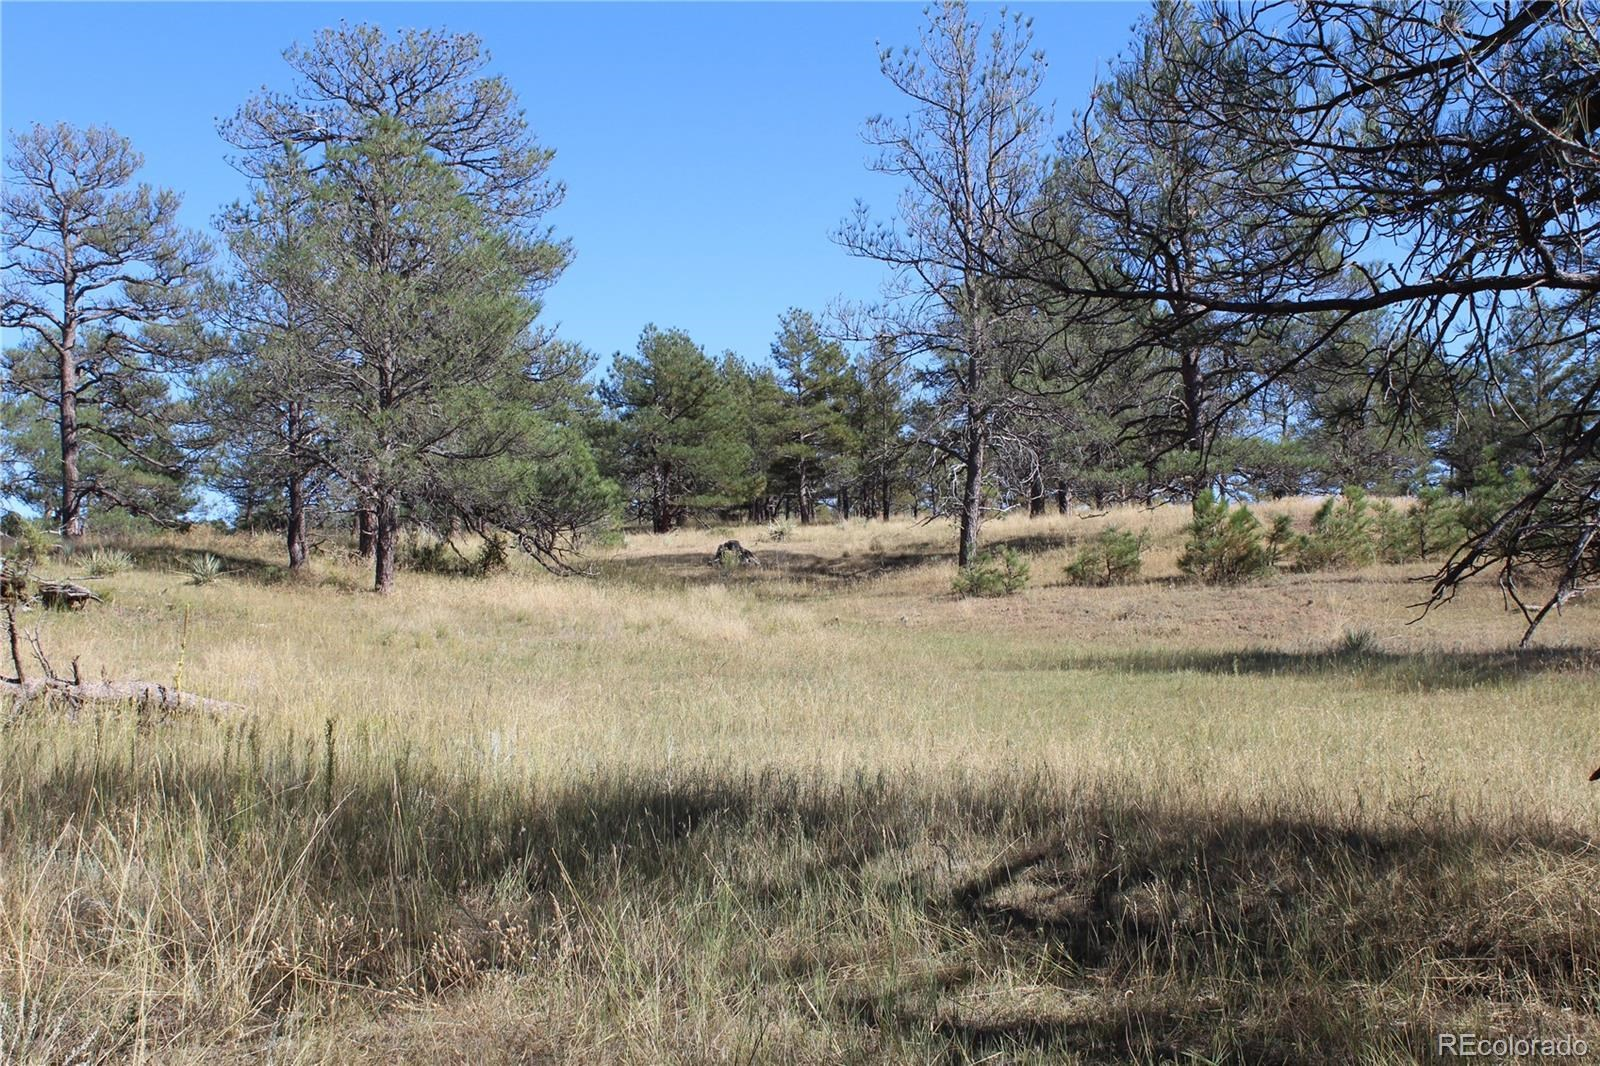 MLS# 2877174 - 12 - Cattle Circle, Kiowa, CO 80117